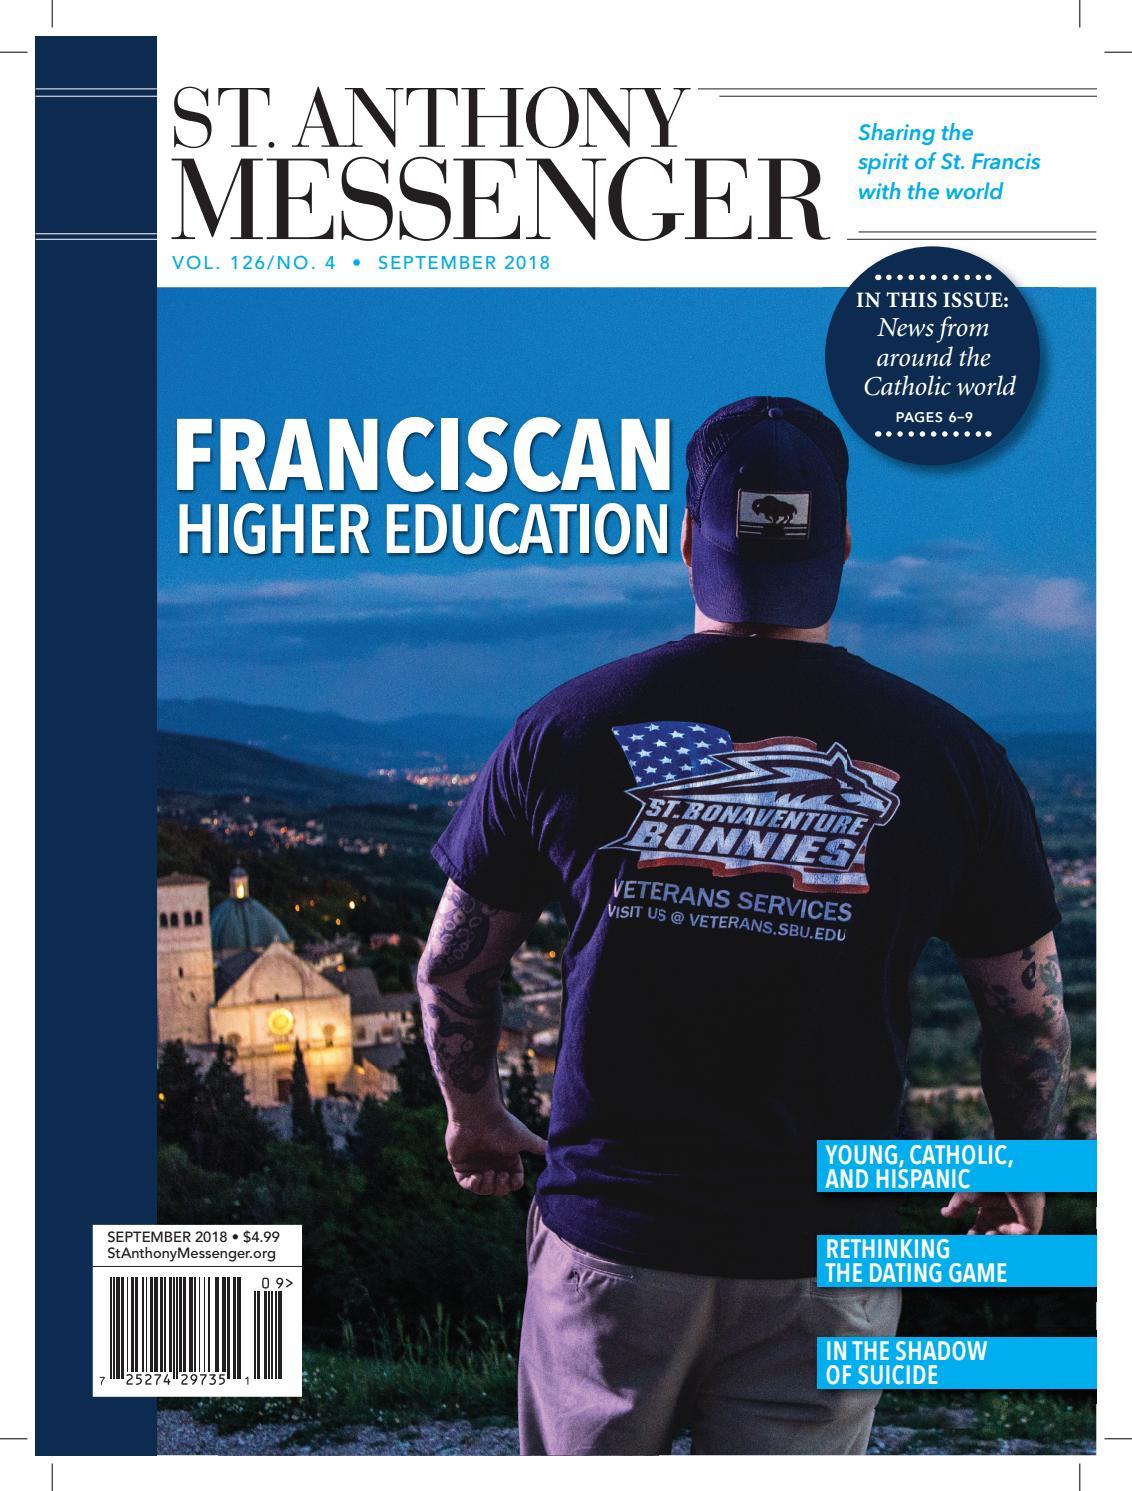 db9103eafa66 St. Anthony Messenger September 2018 by Franciscan Media - issuu